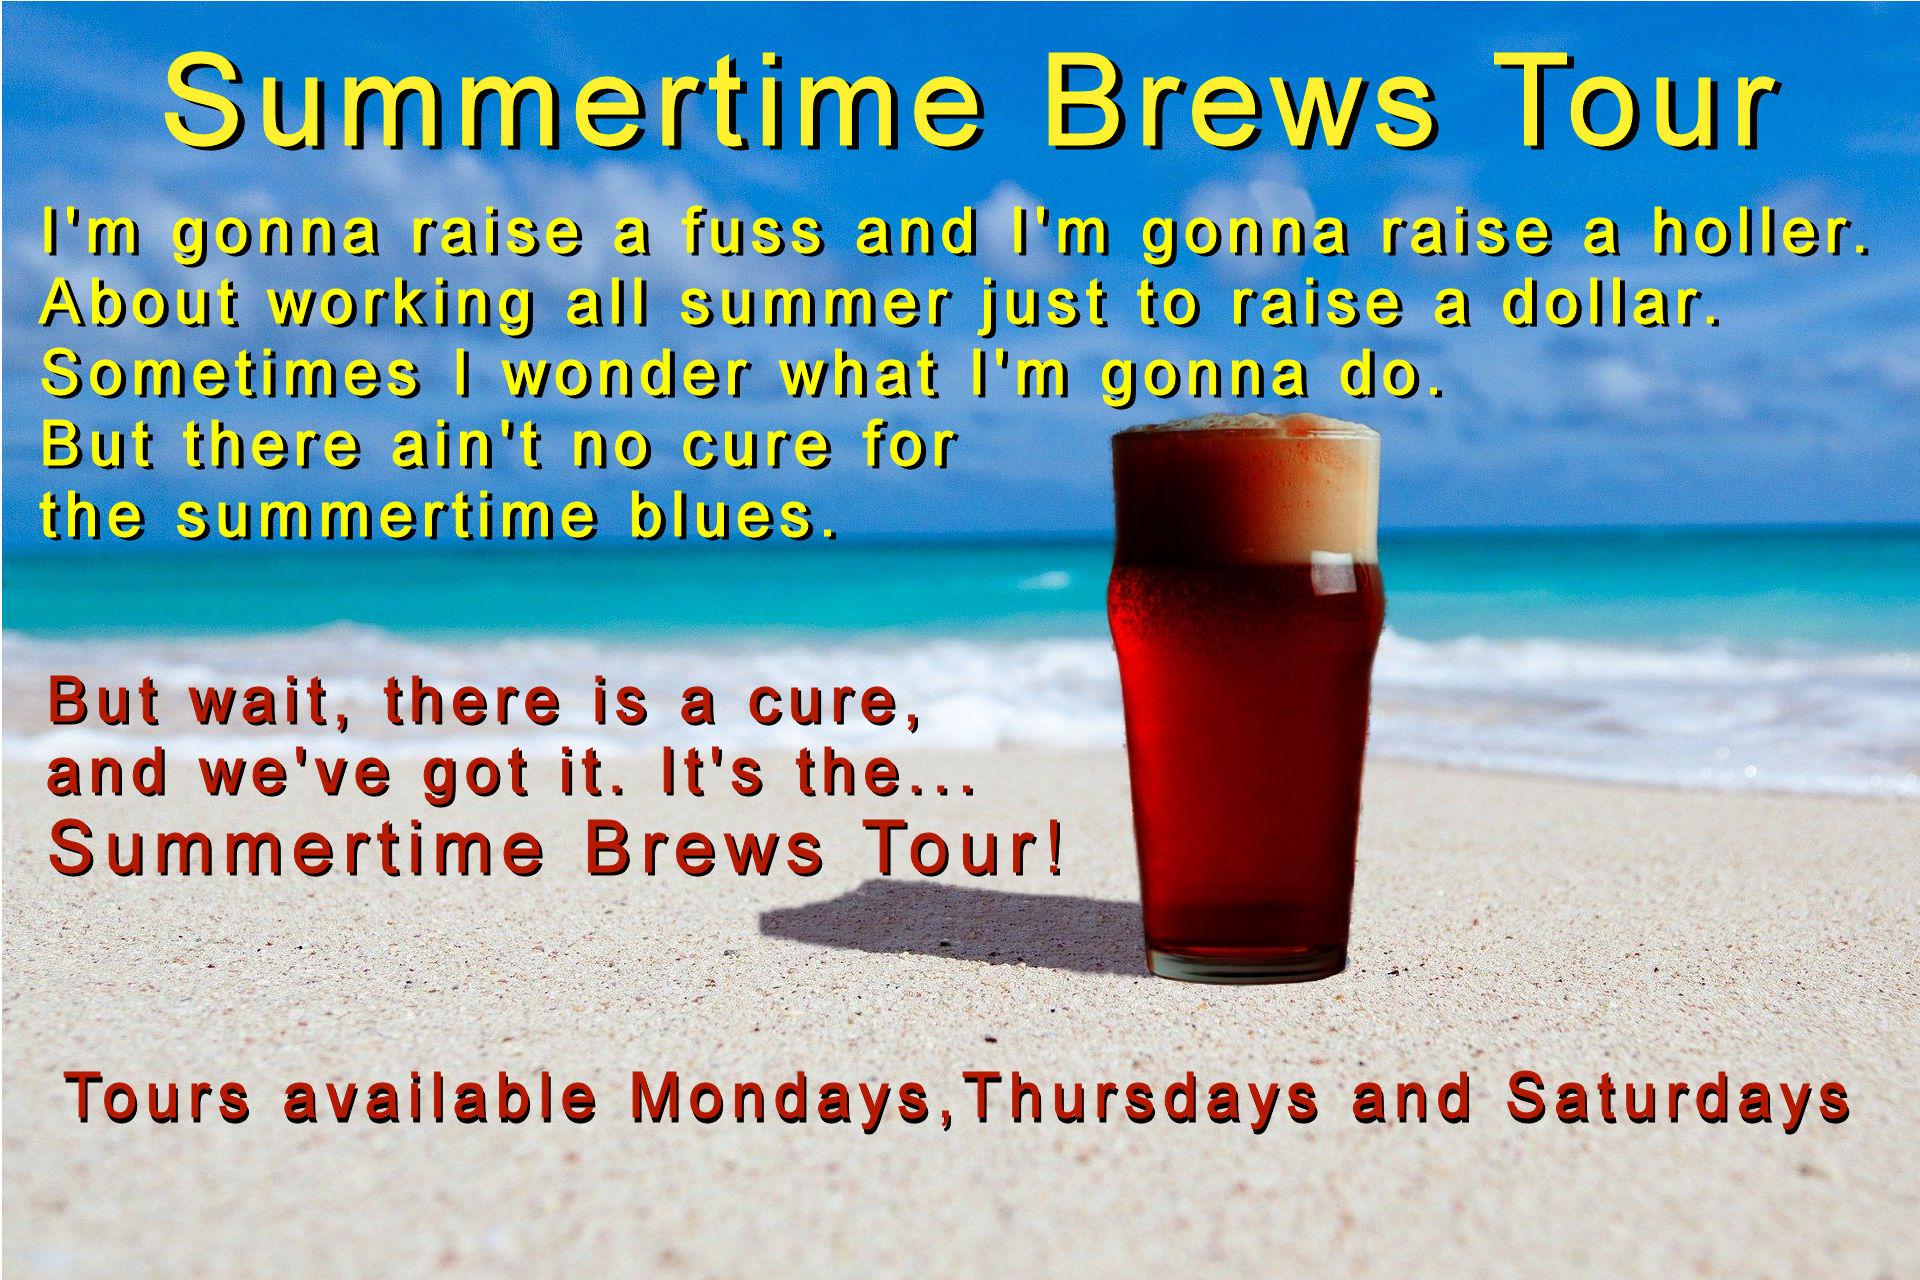 Summertime Brews Tour. Springs Beer Tours.